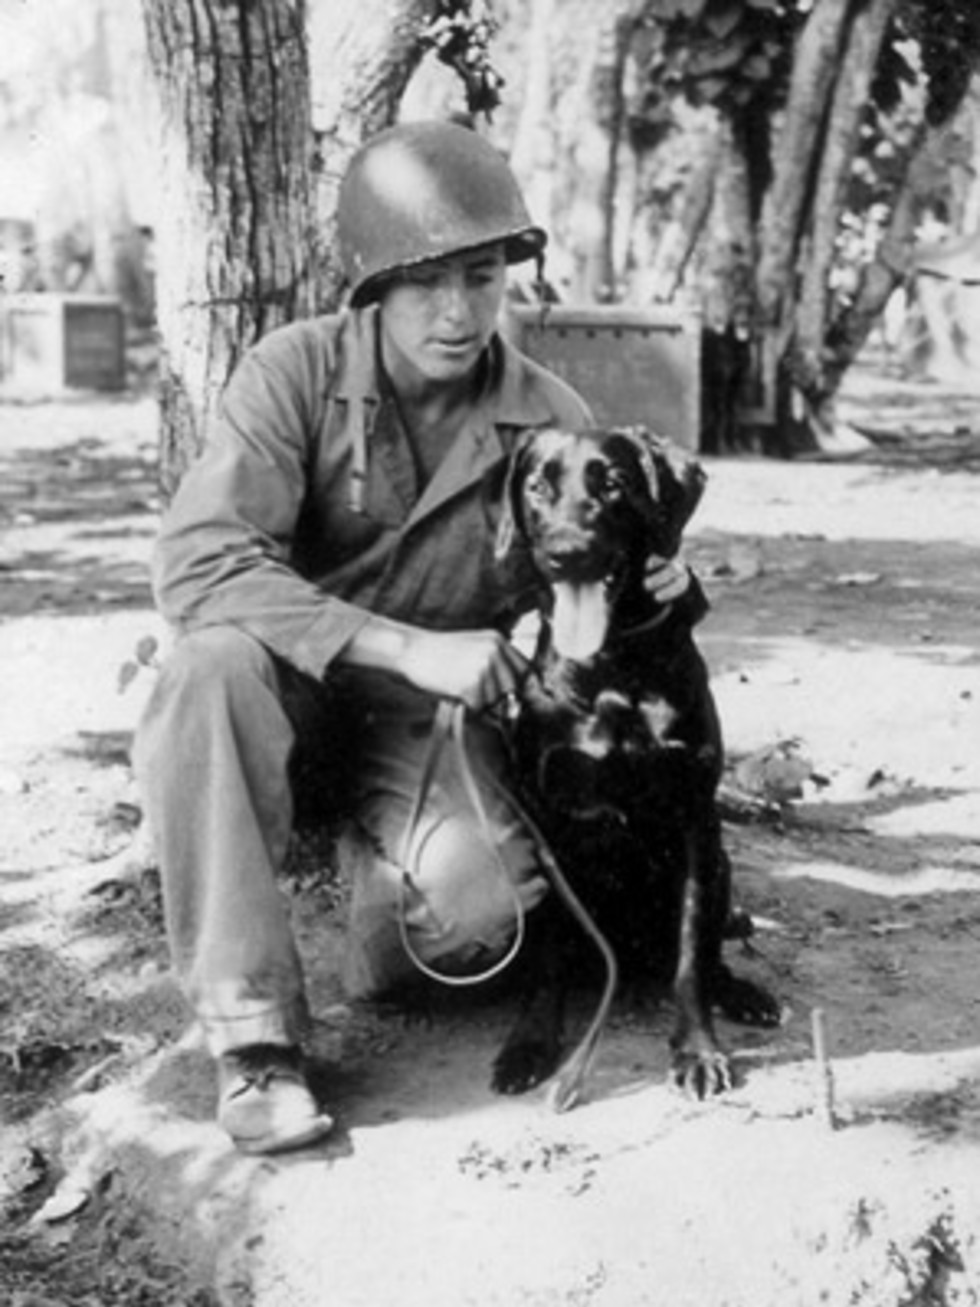 News_Joe Leydon_War Dogs of the Pacific_dog handler_Dale Fetzer_Skipper